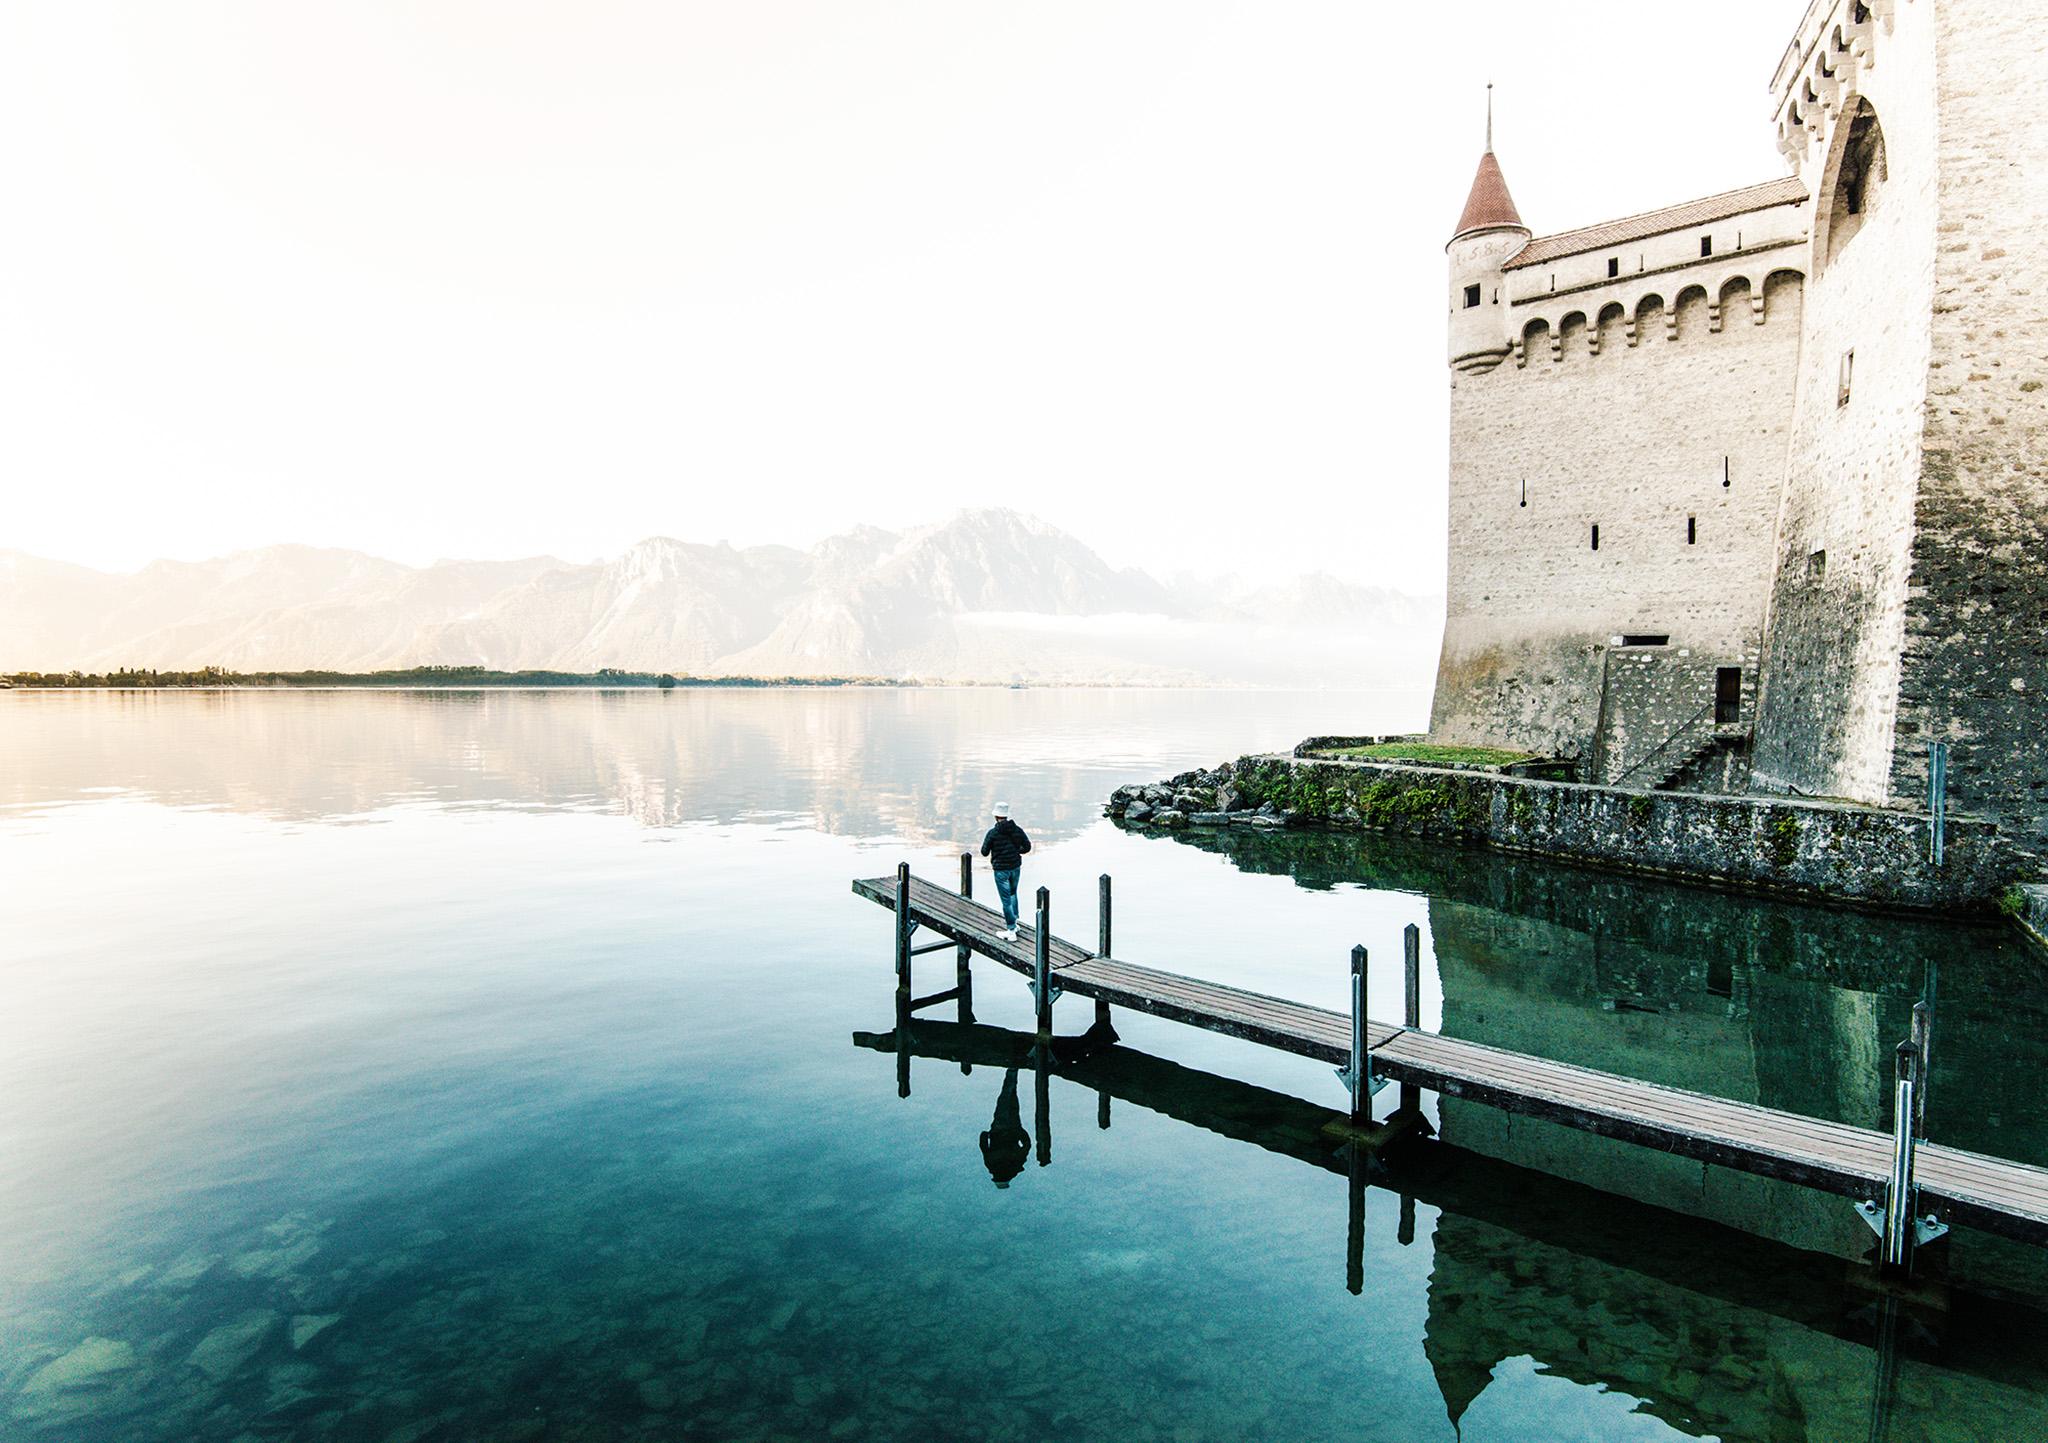 kt_2020_300_Keytours_excursions_Swisstours_chateau-chillon25_2048_10